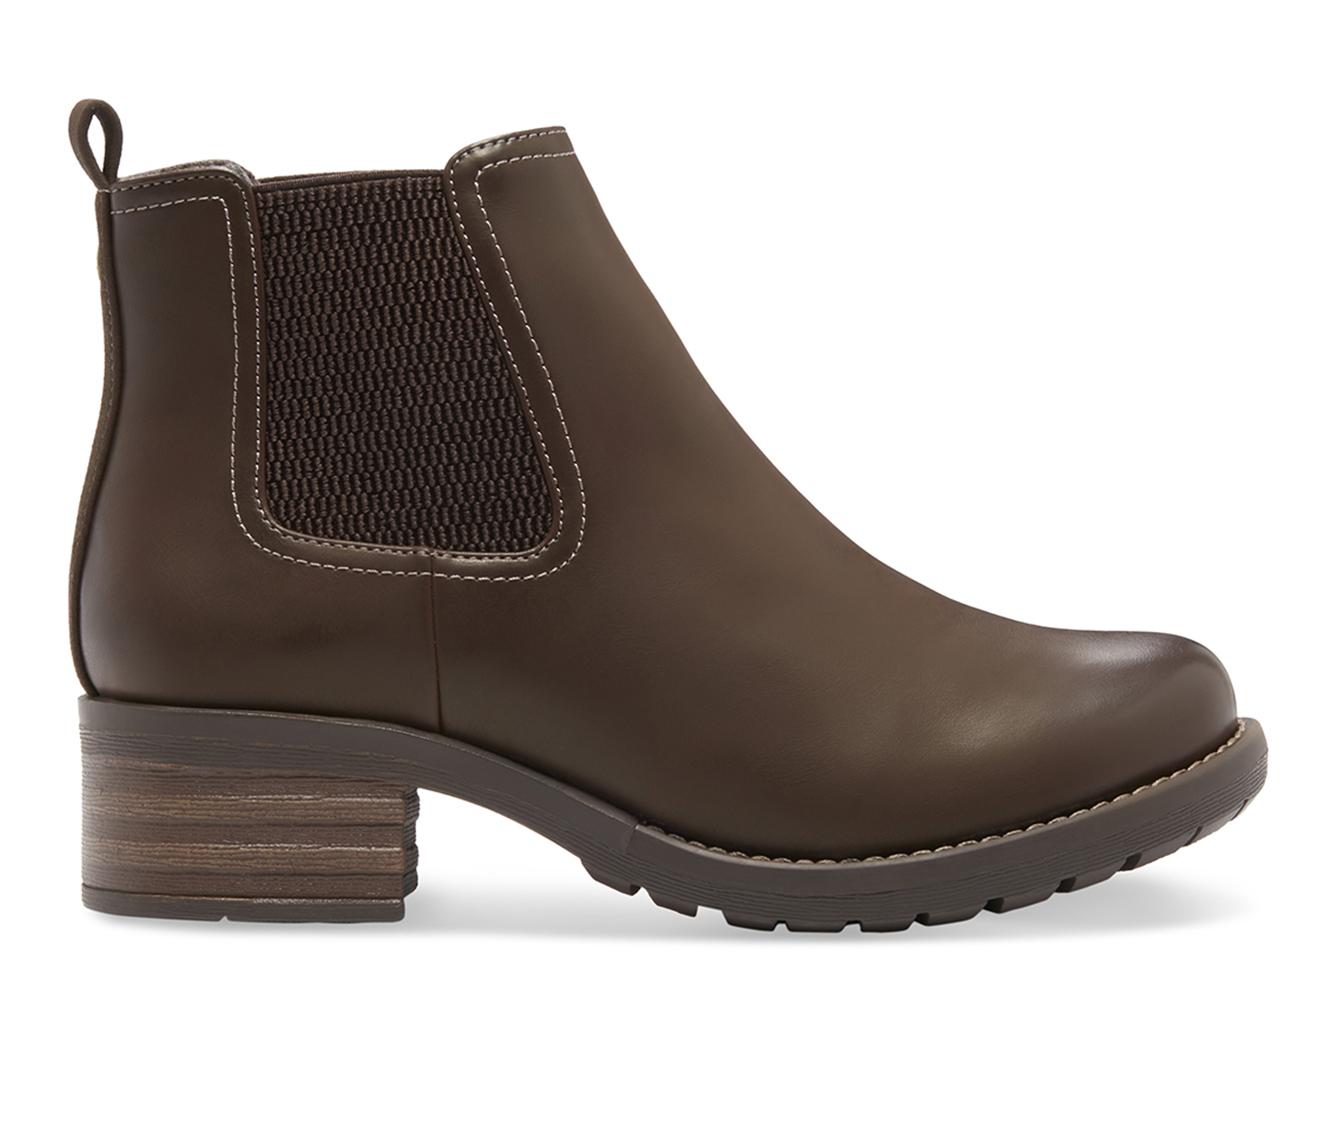 Eastland Jasmine Women's Boots (Brown - Leather)